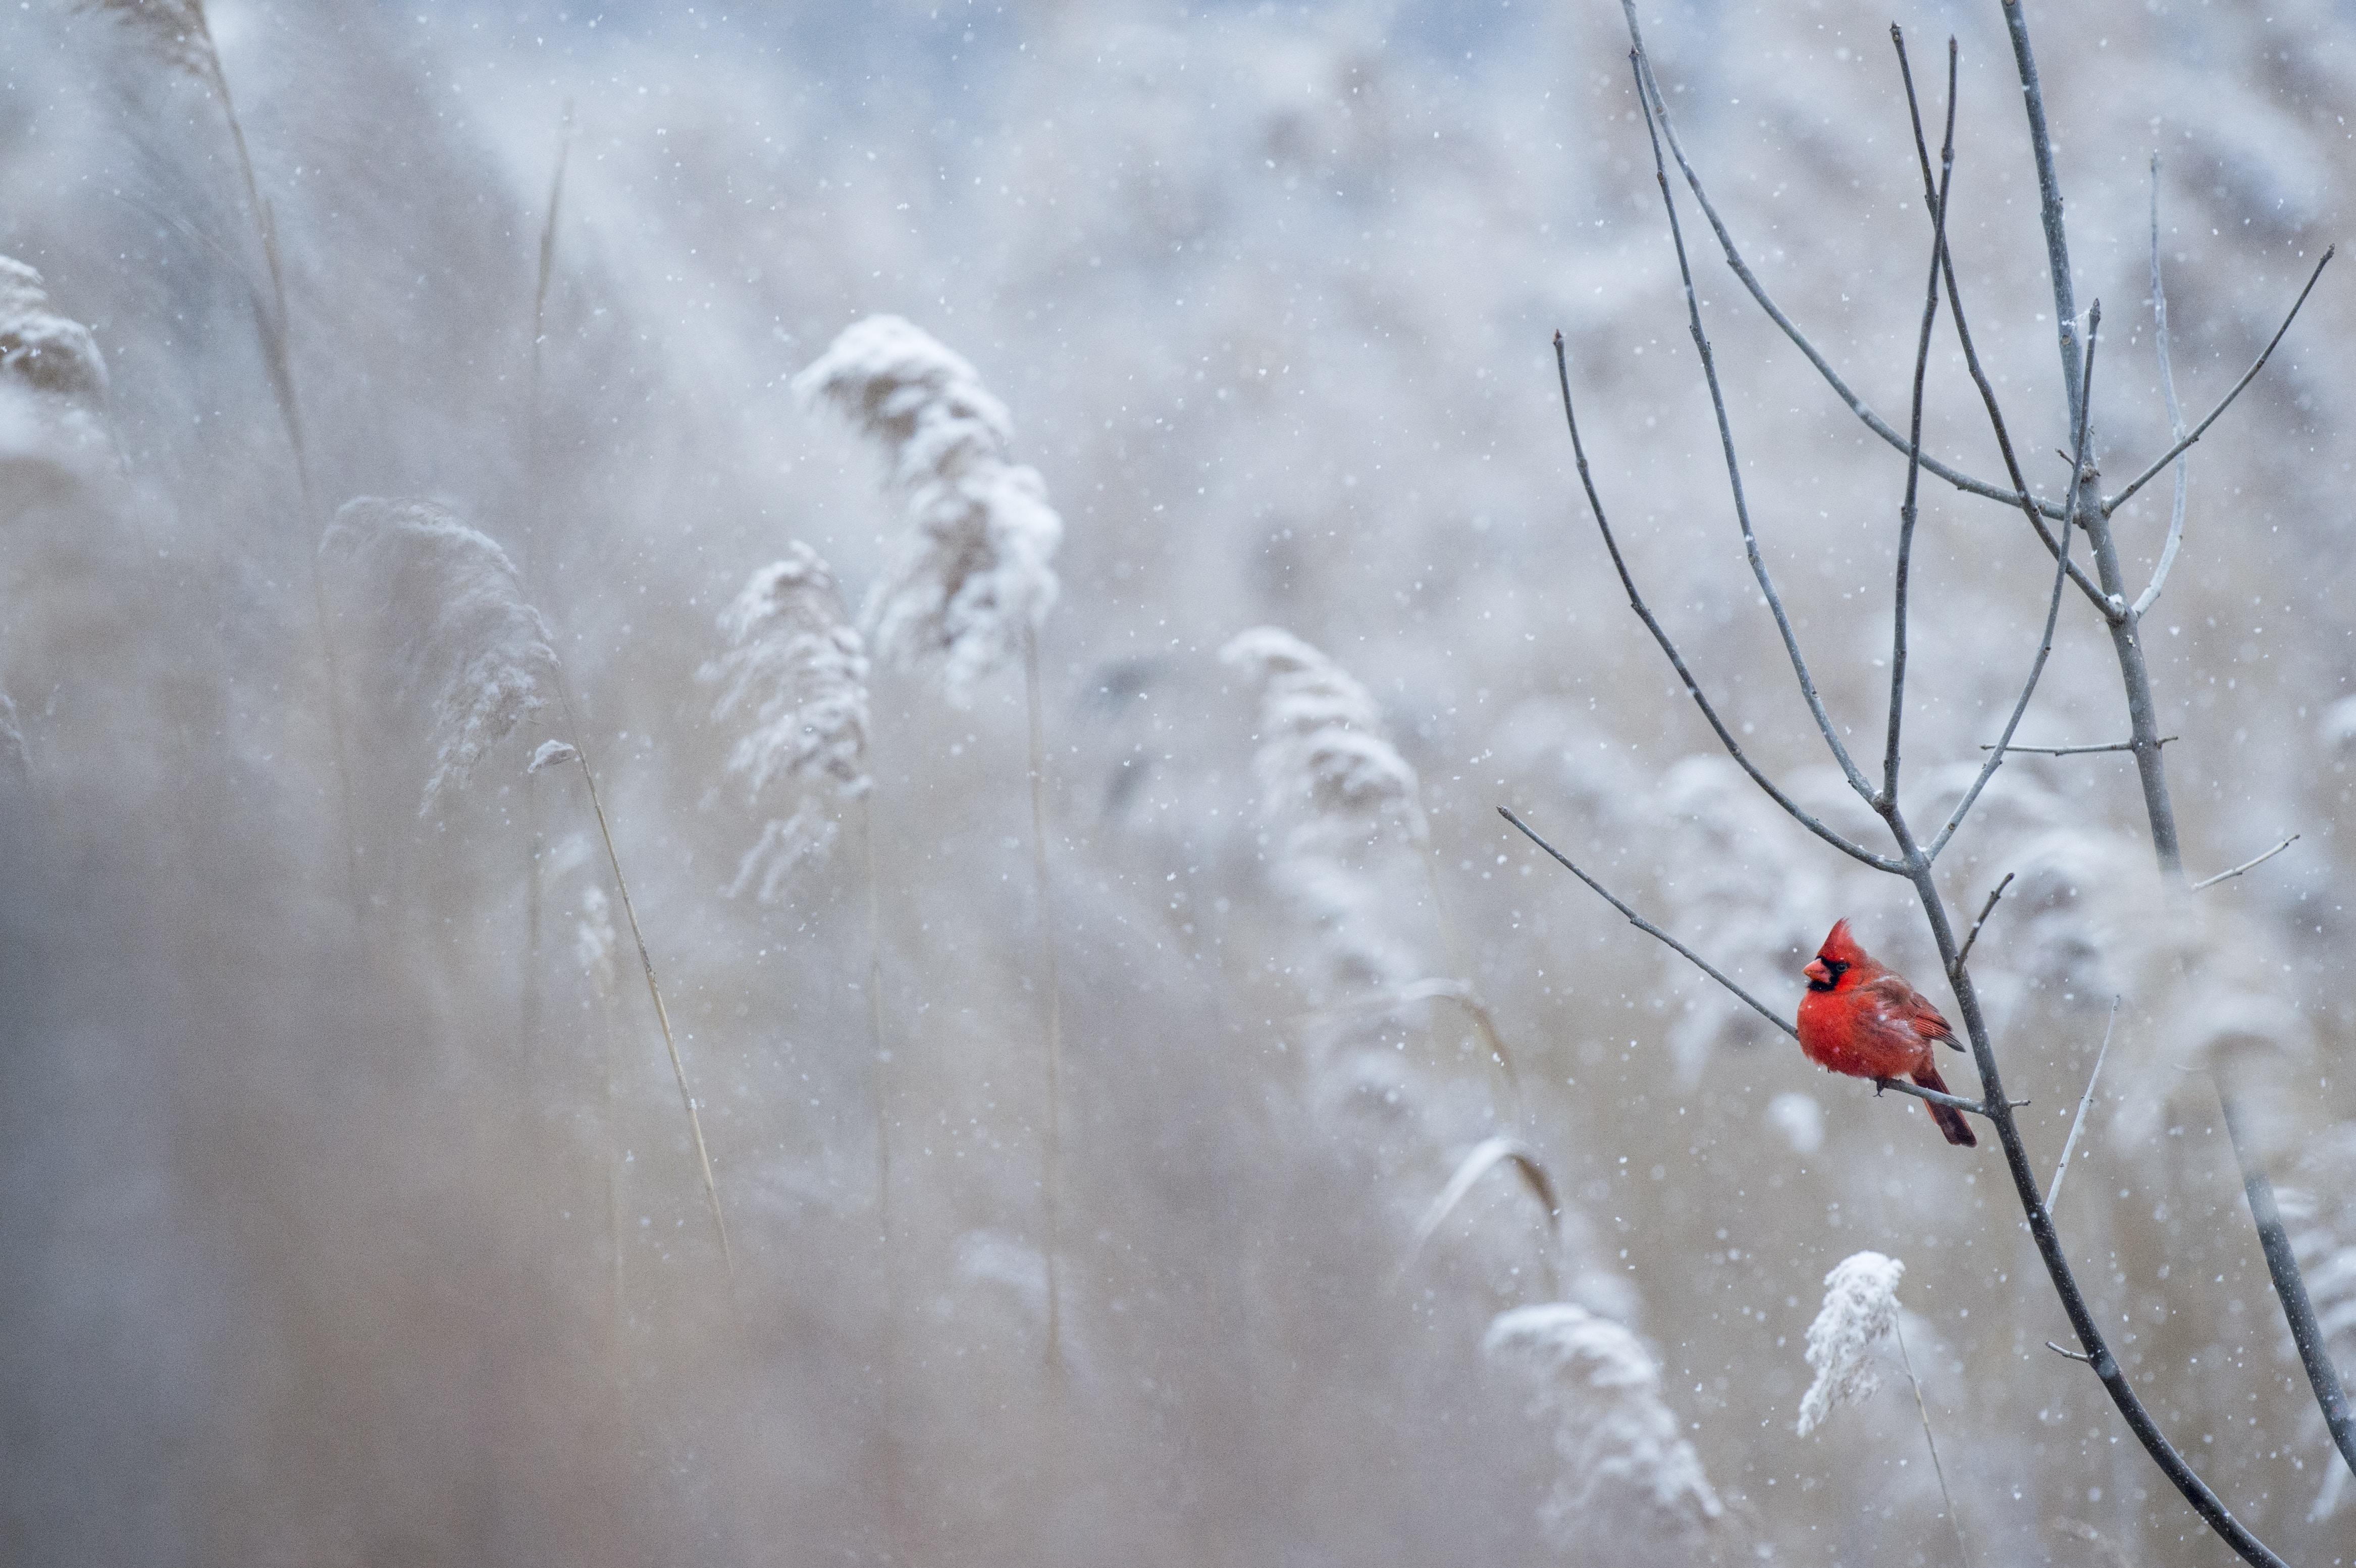 Winter winter stories